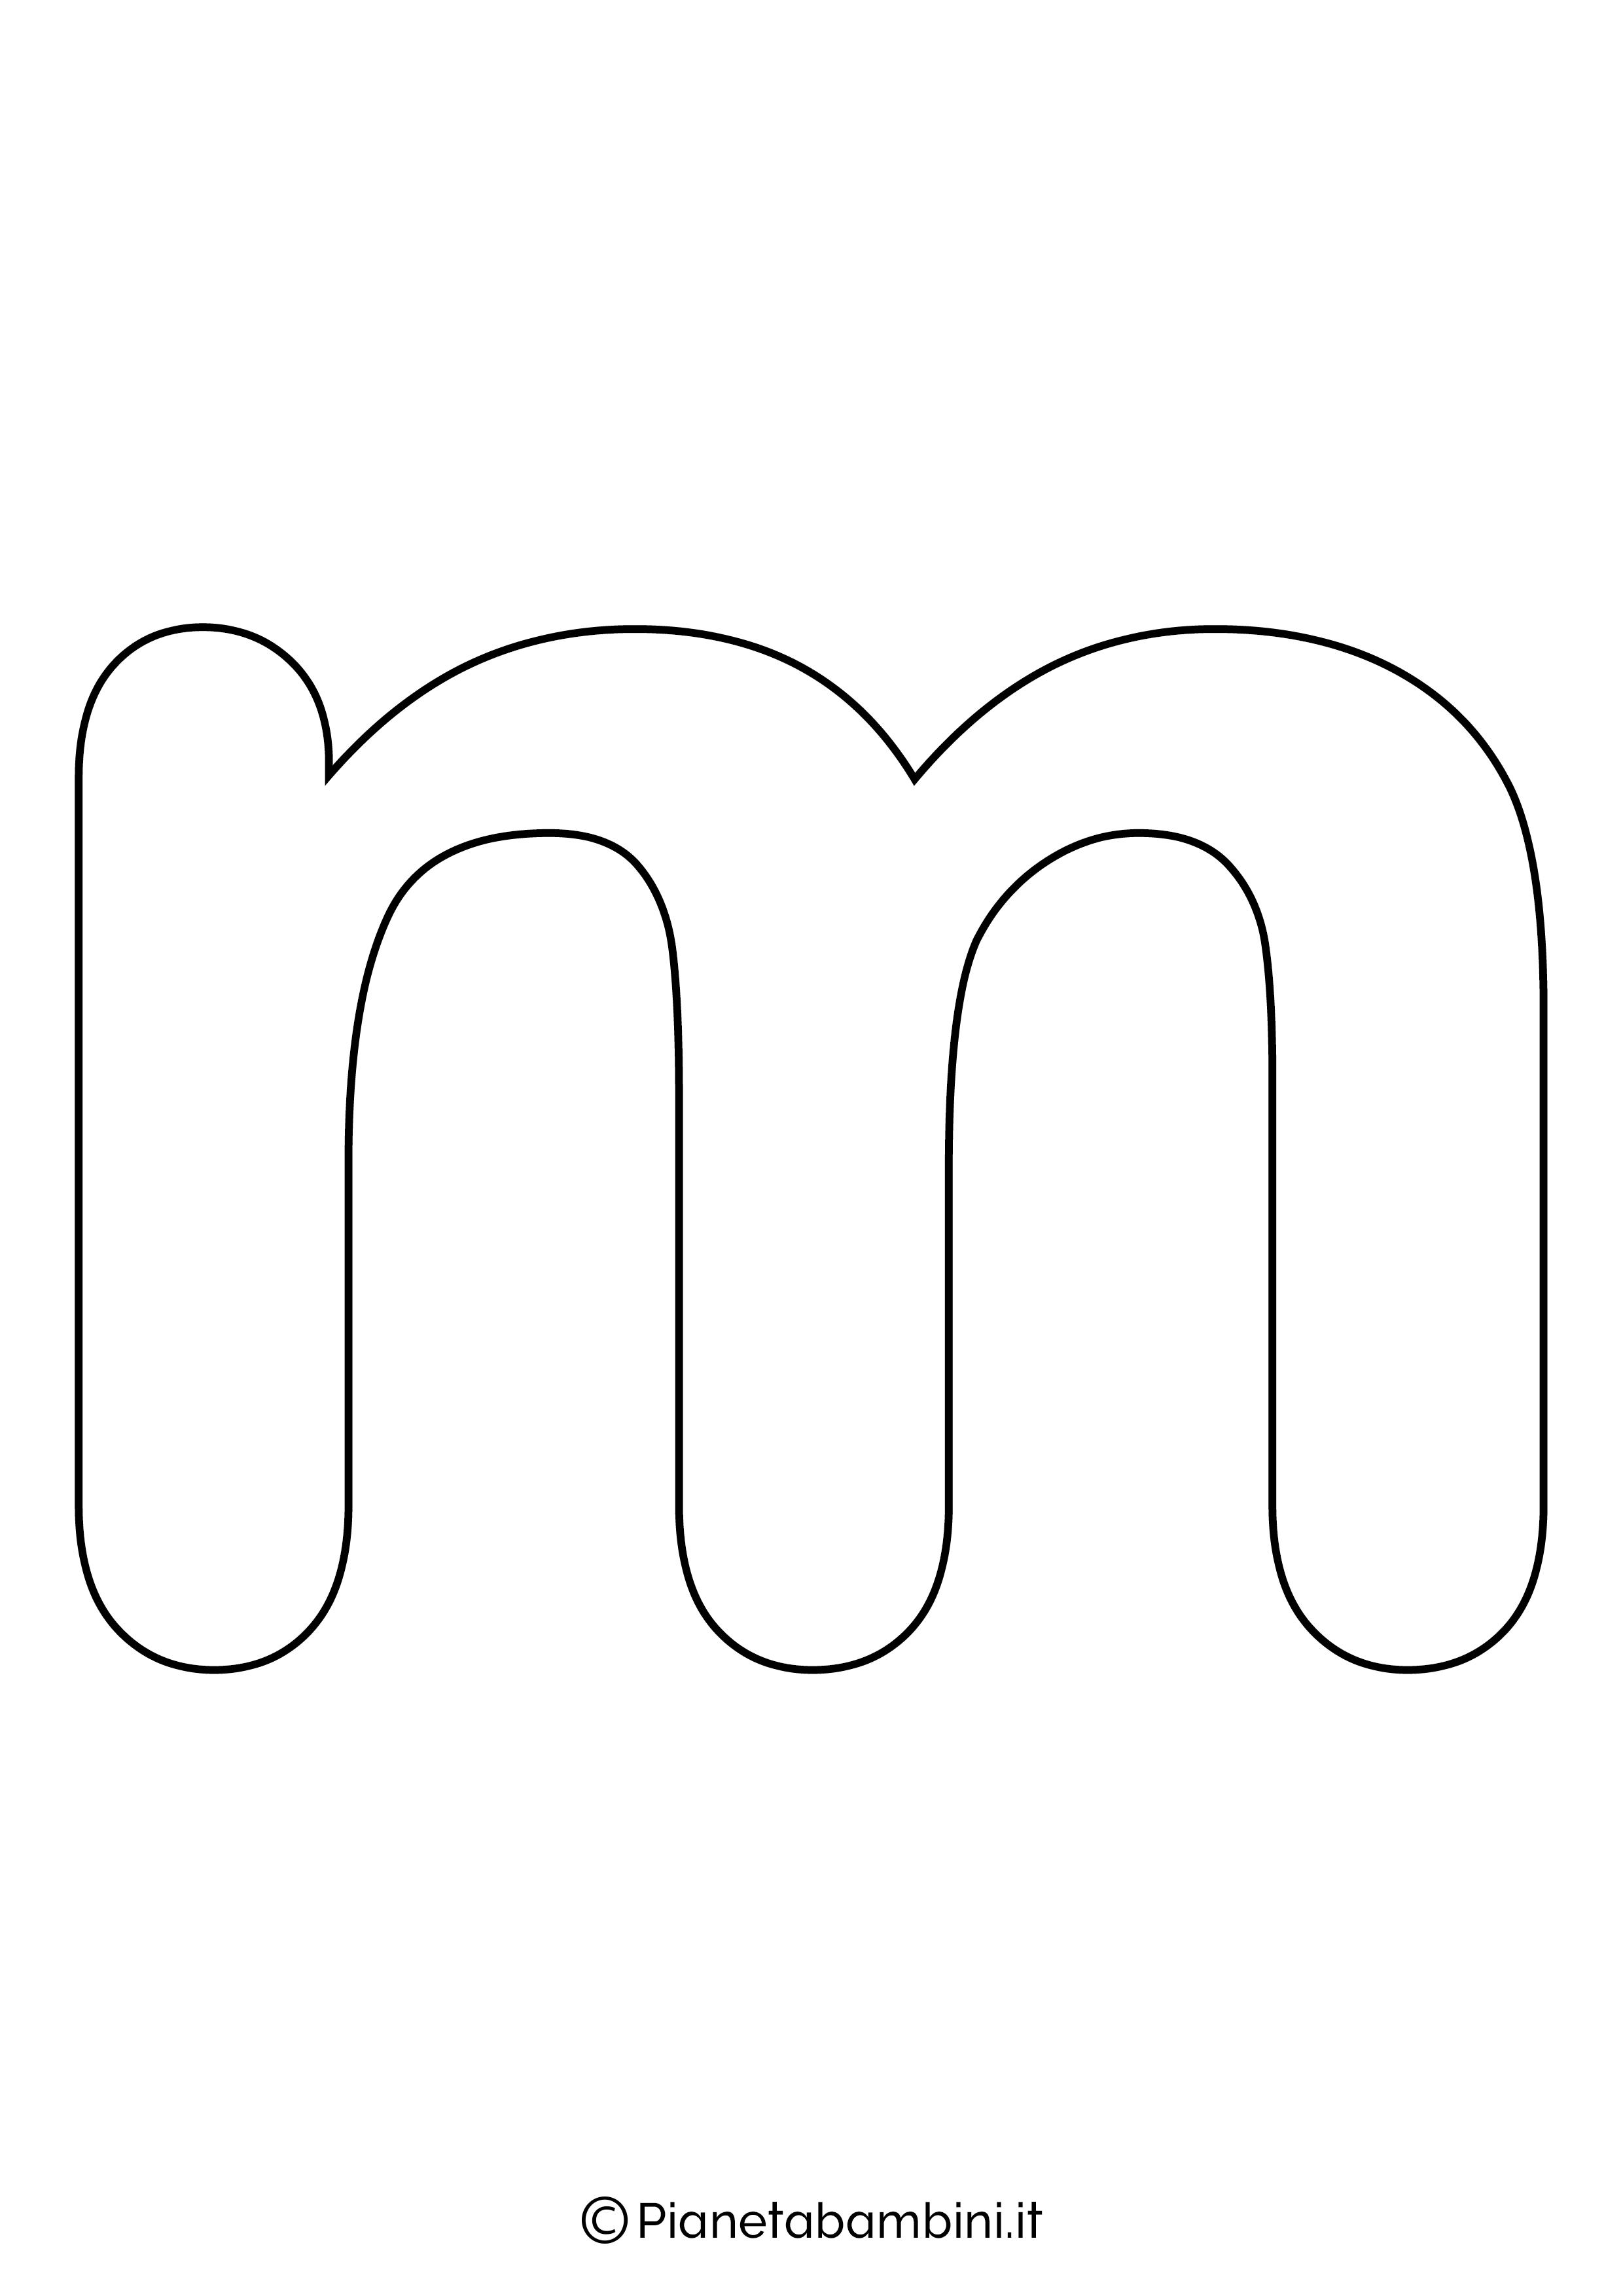 Lettera M minuscola da stampare